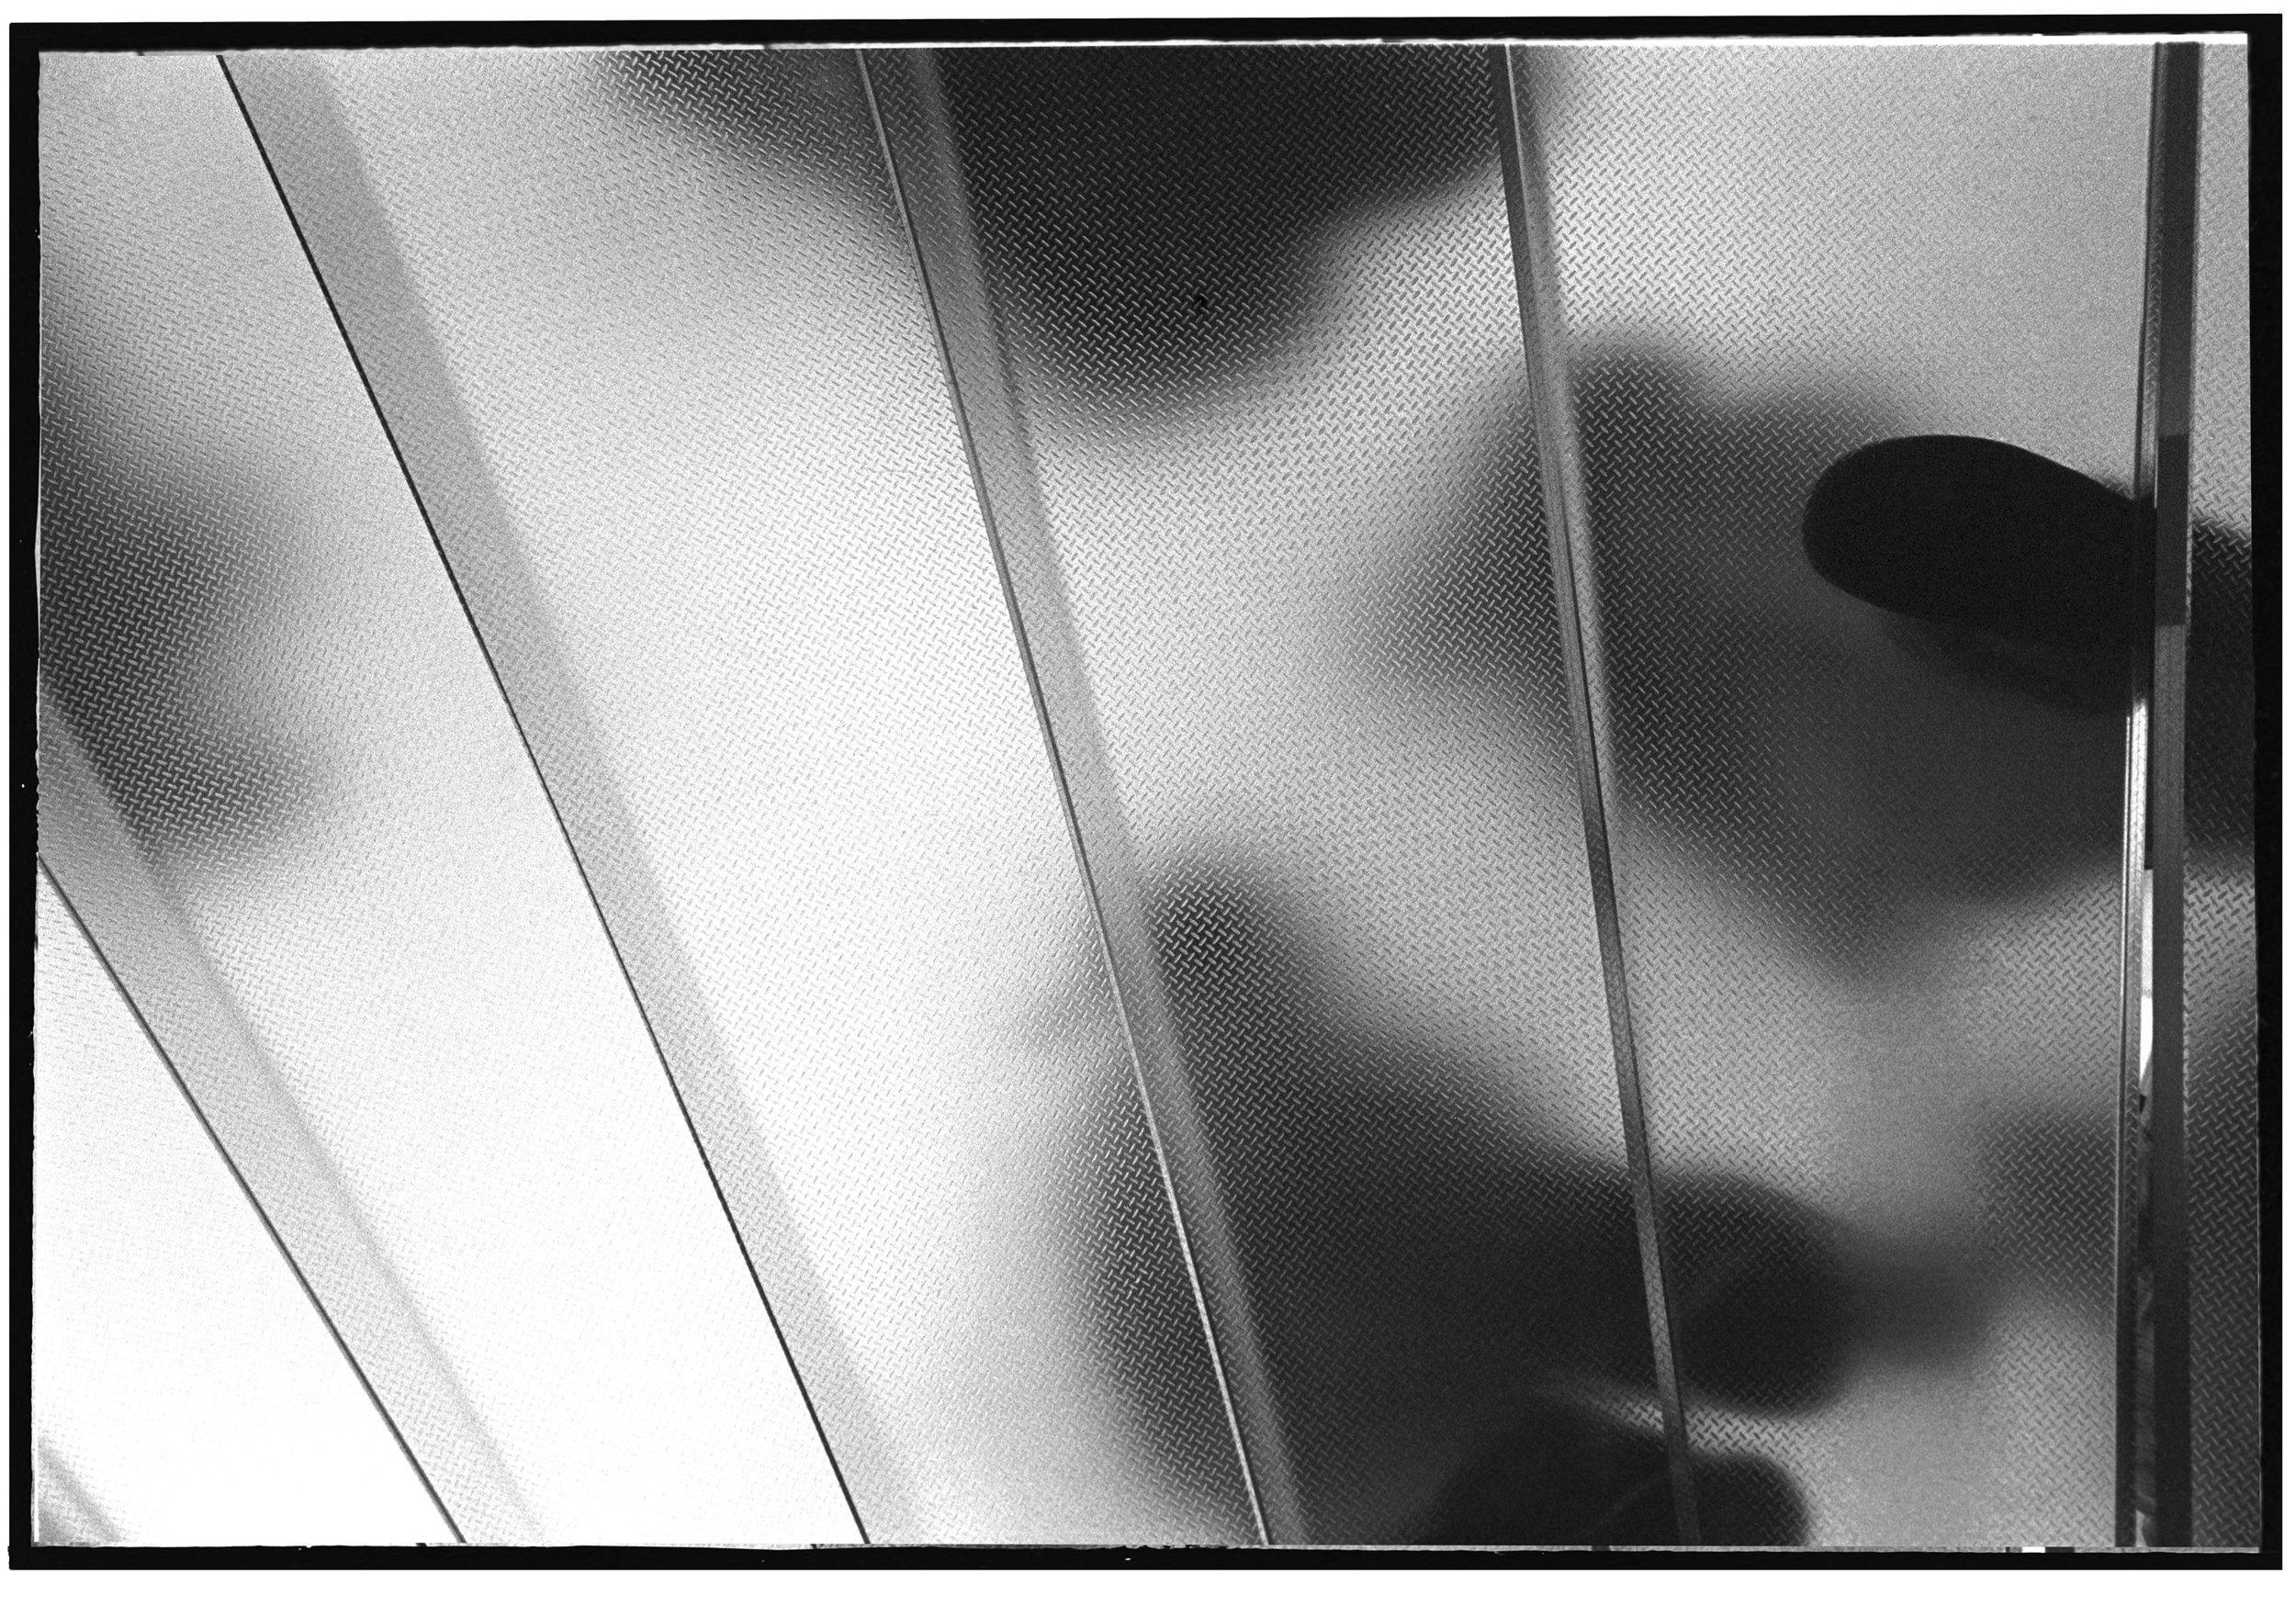 Underfoot_04.jpg